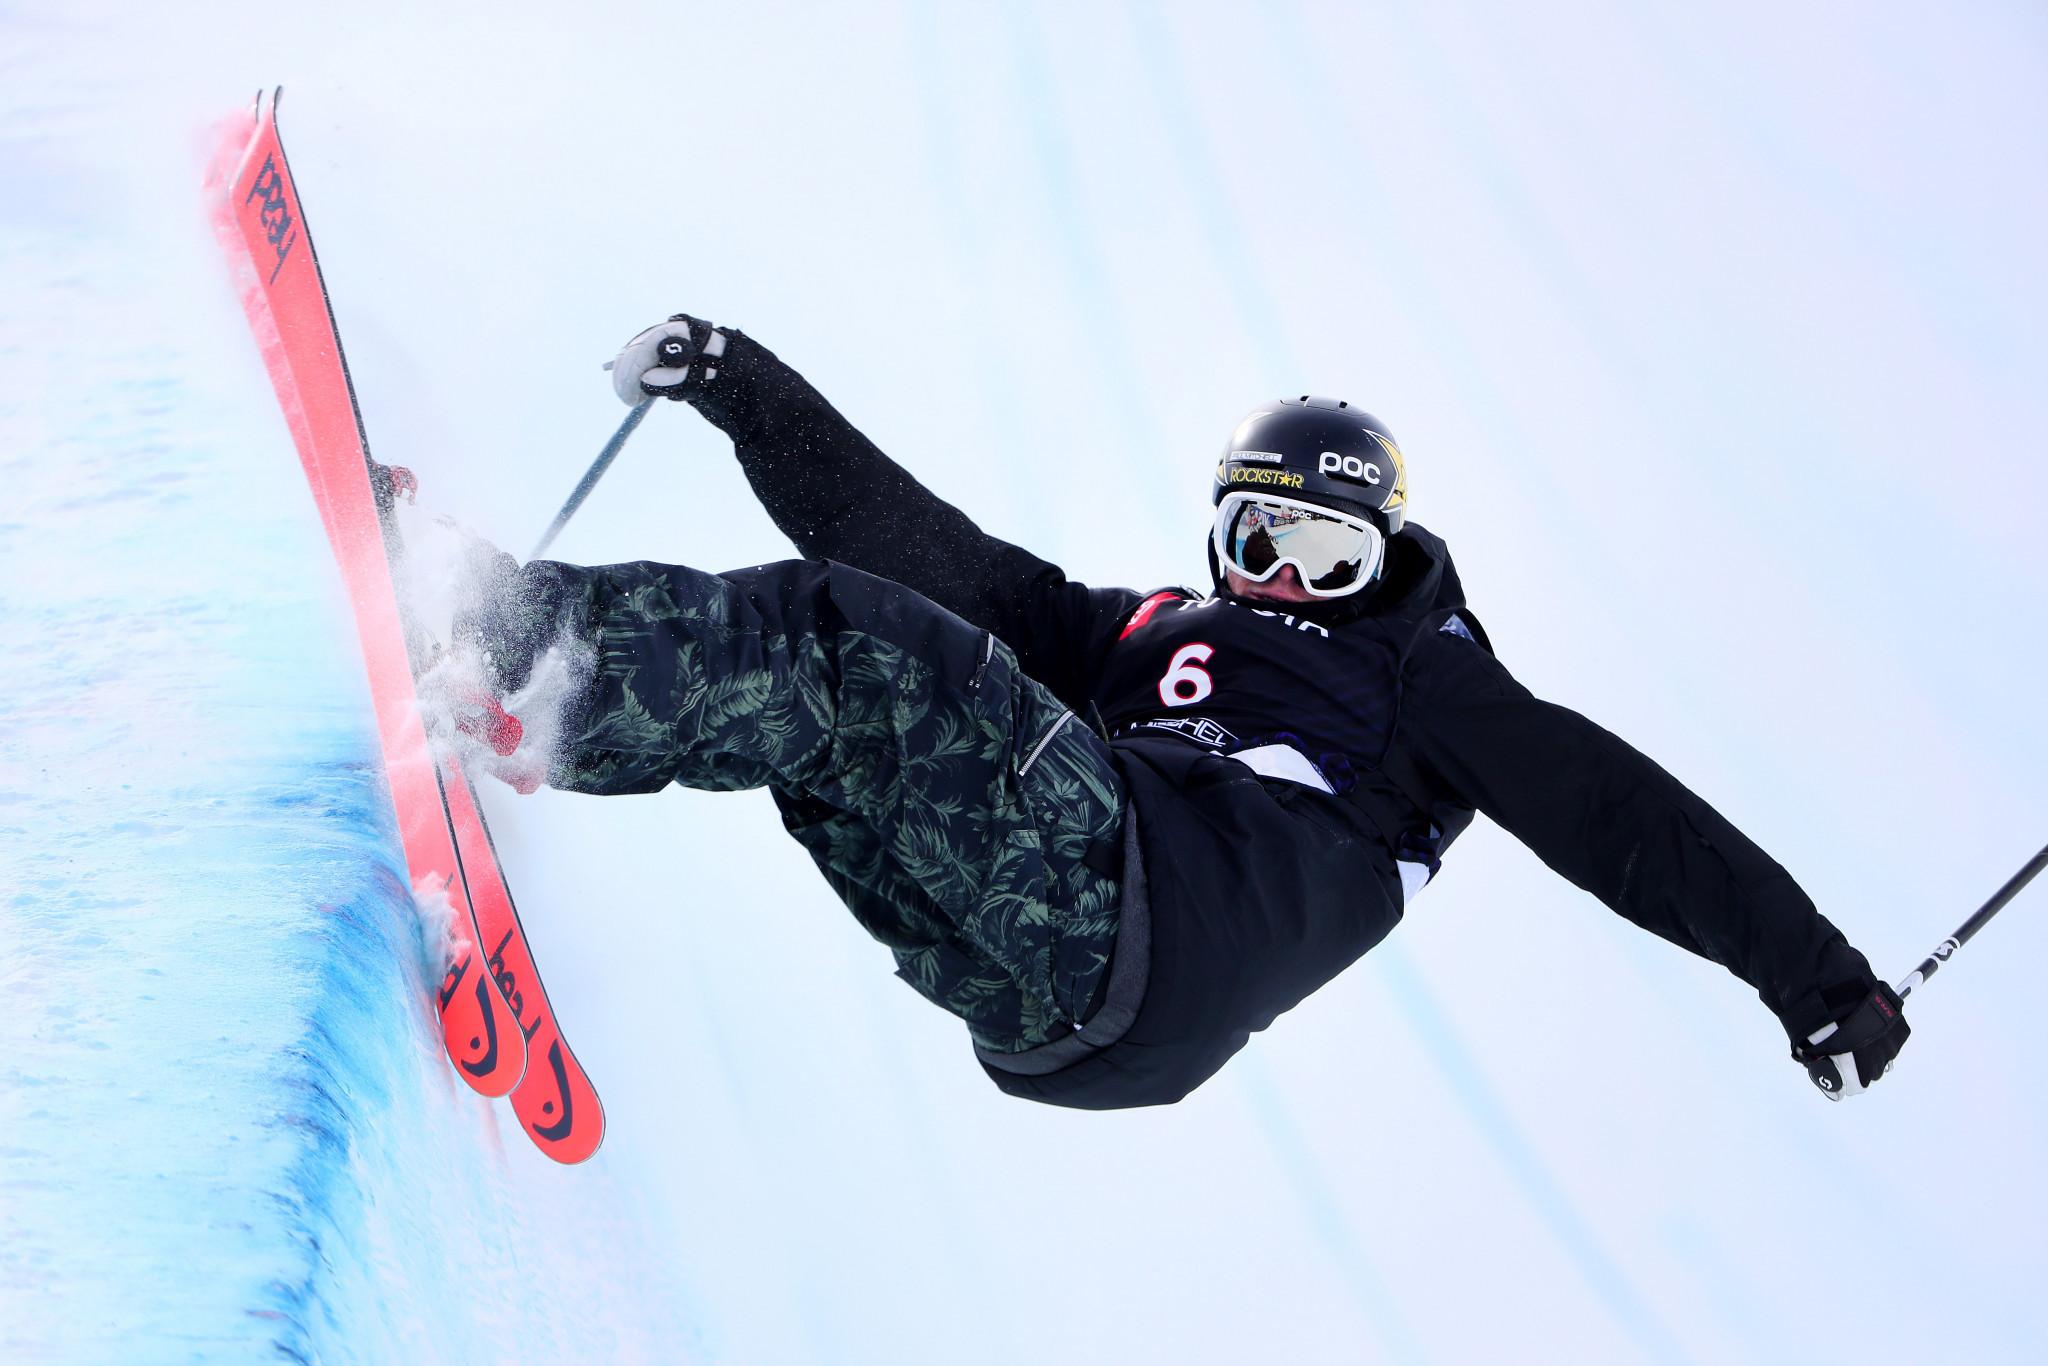 Cardrona set to host season-opening FIS Freeski World Cup